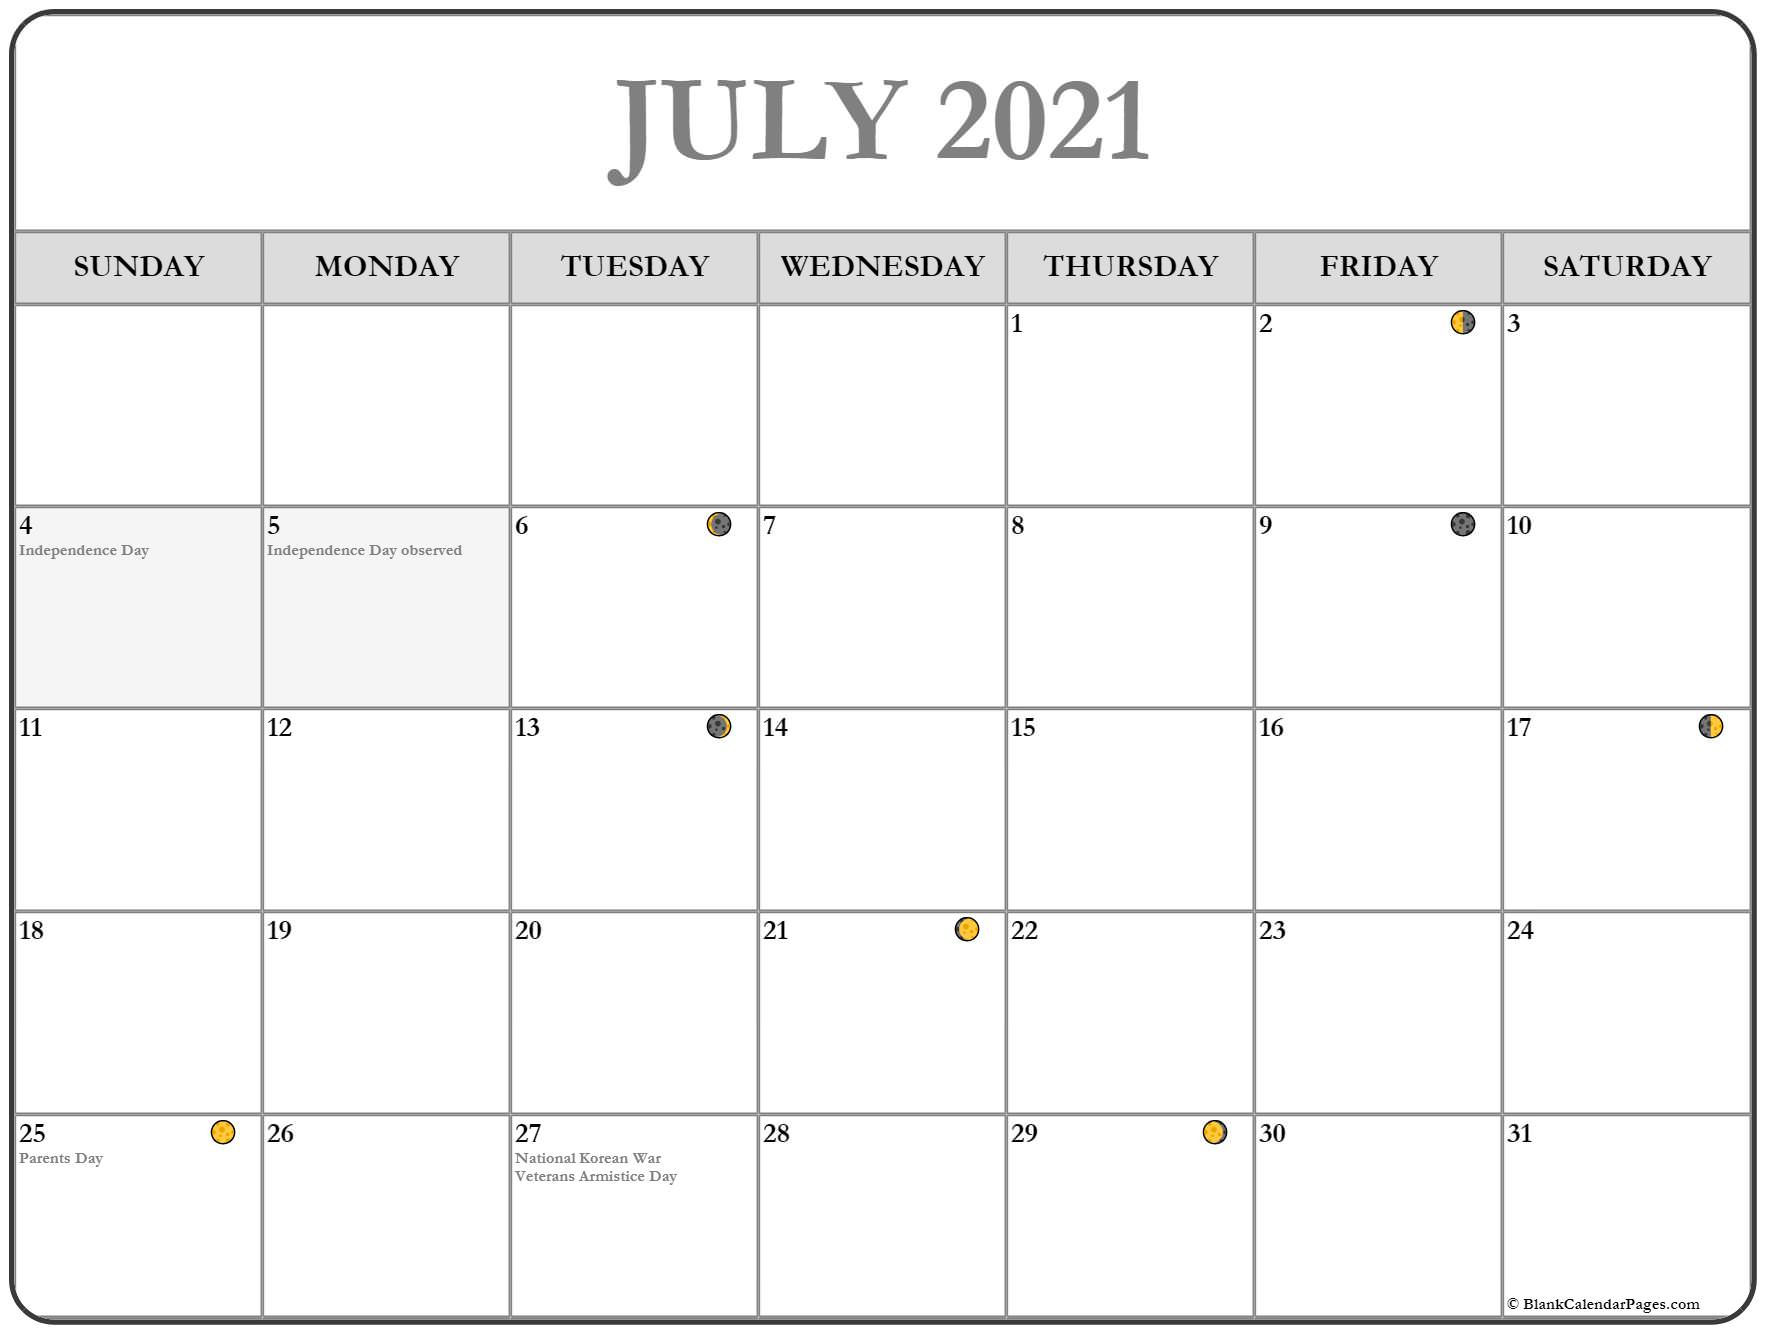 2021 Deer Hunting Lunar Calendar | Printable Calendar 2020